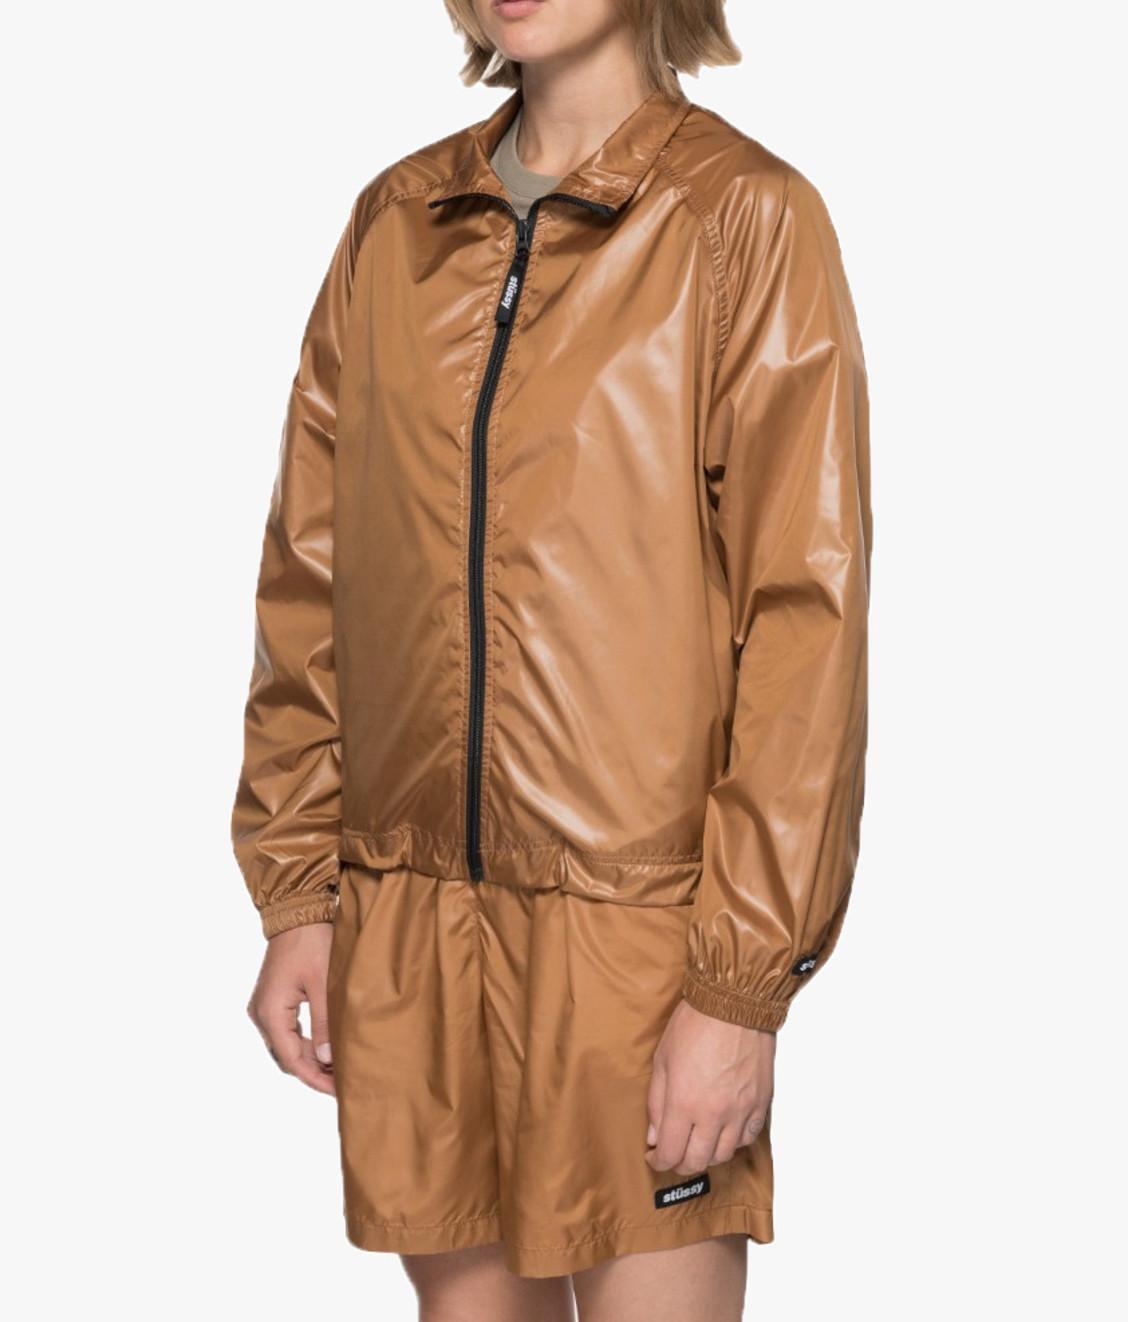 Stussy Stussy Langley Shiny Zip Jacket Tan